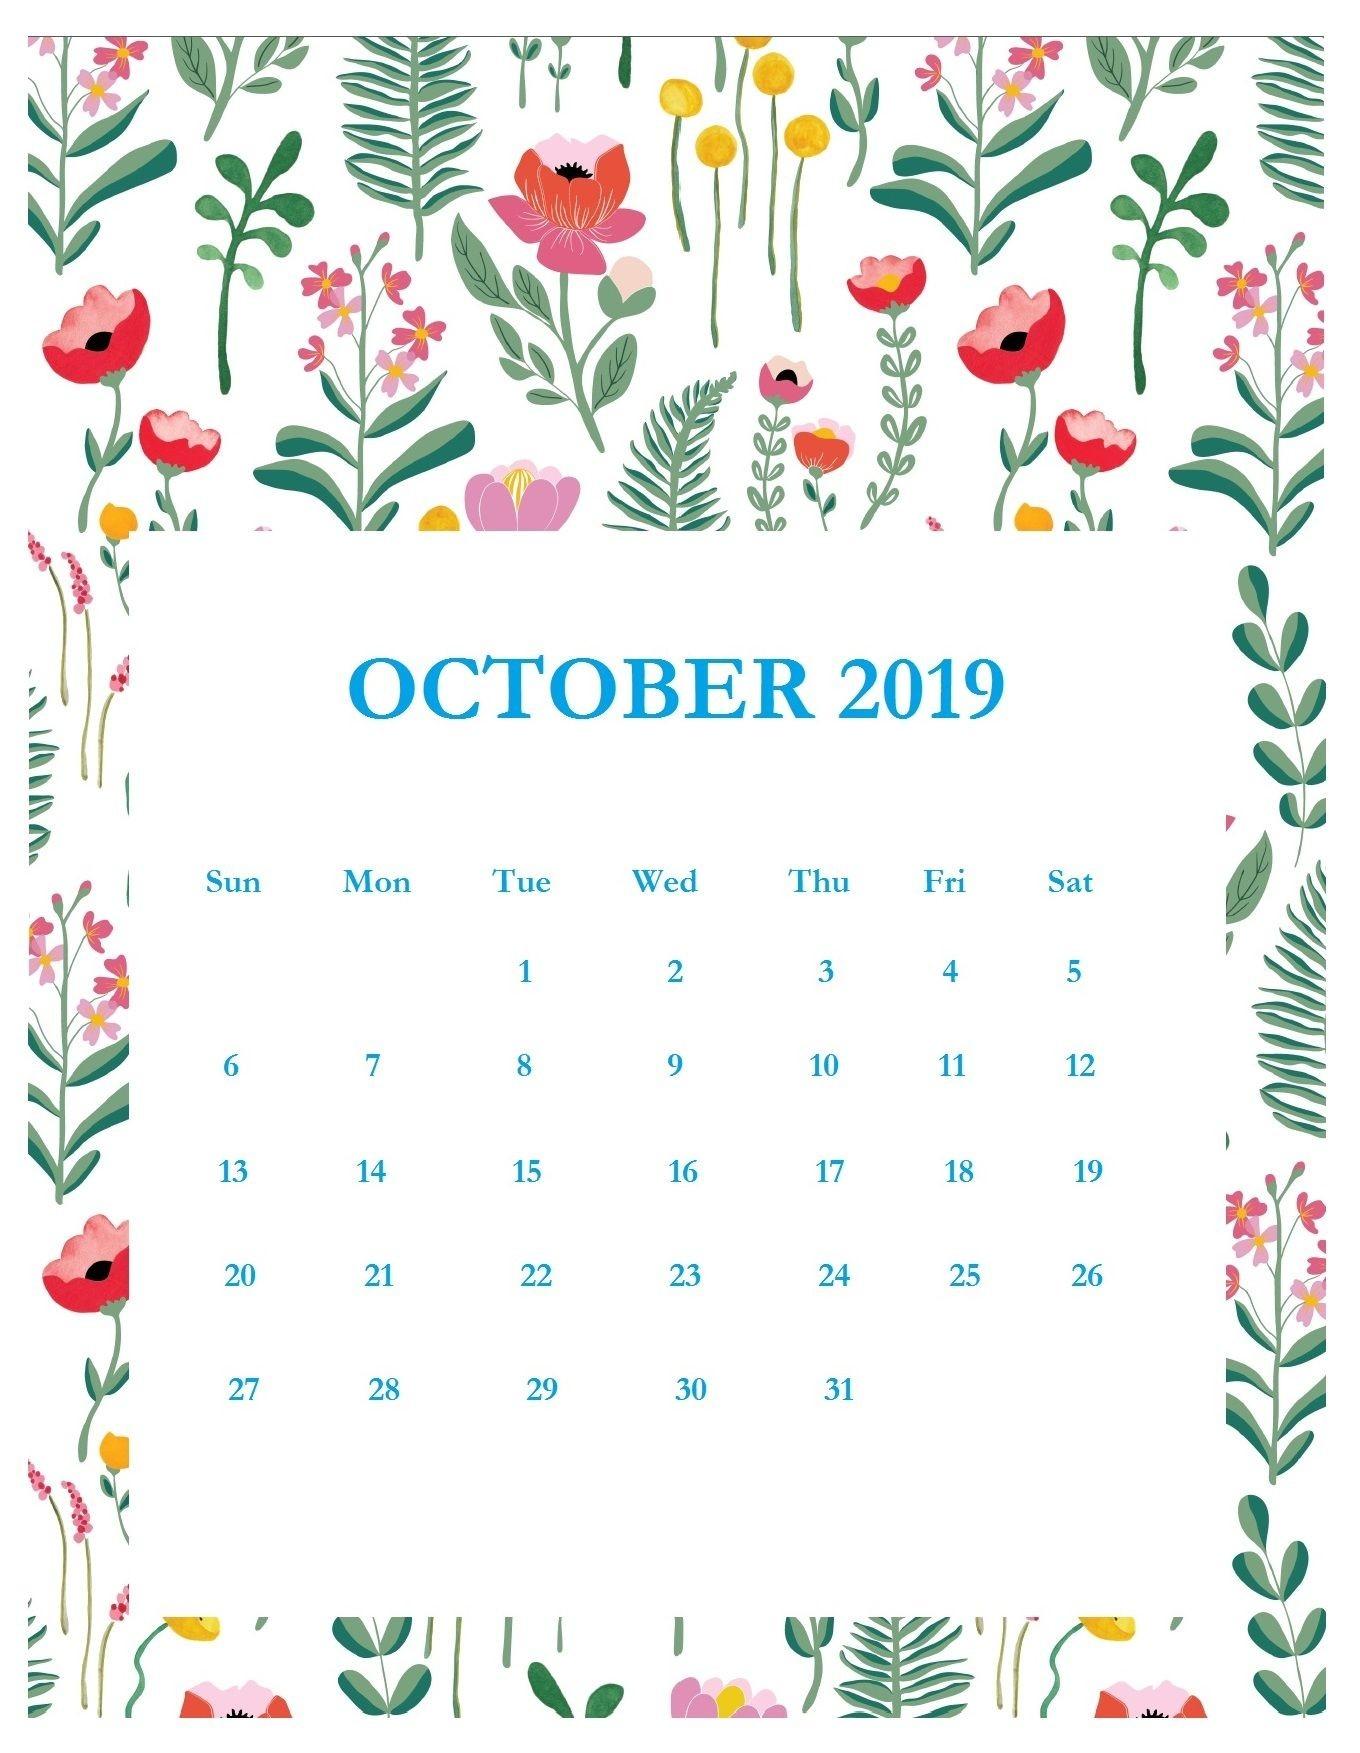 Print Beautiful October 2019 Calendar Template-Template For Calendars With Flowers